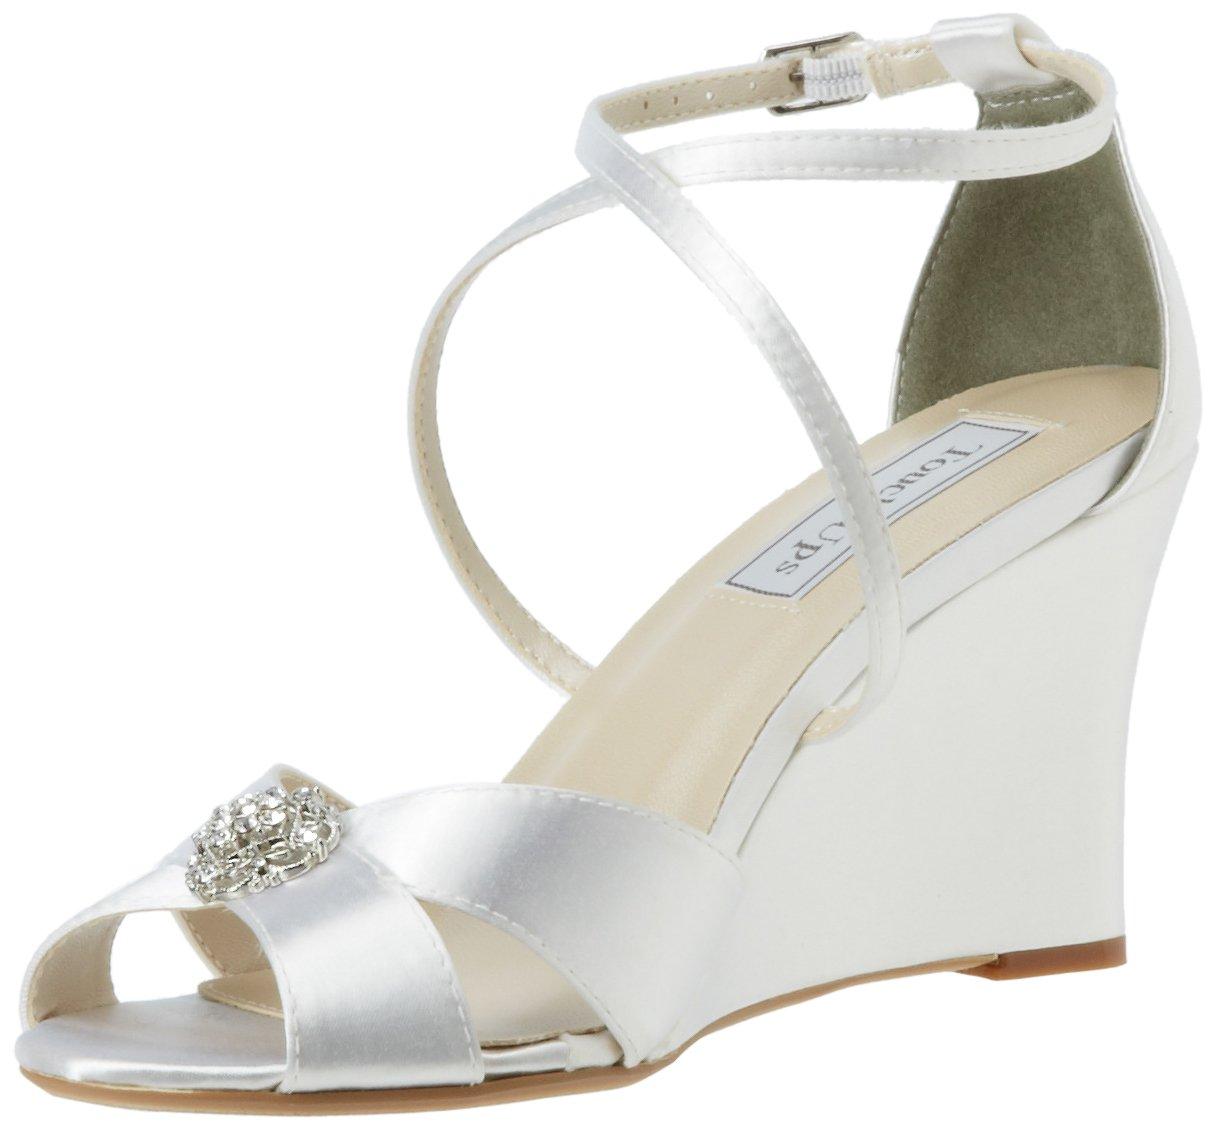 Touch Ups Women's Mickey Wedge Sandal B009P4FZRK 10.5 B(M) US White Satin